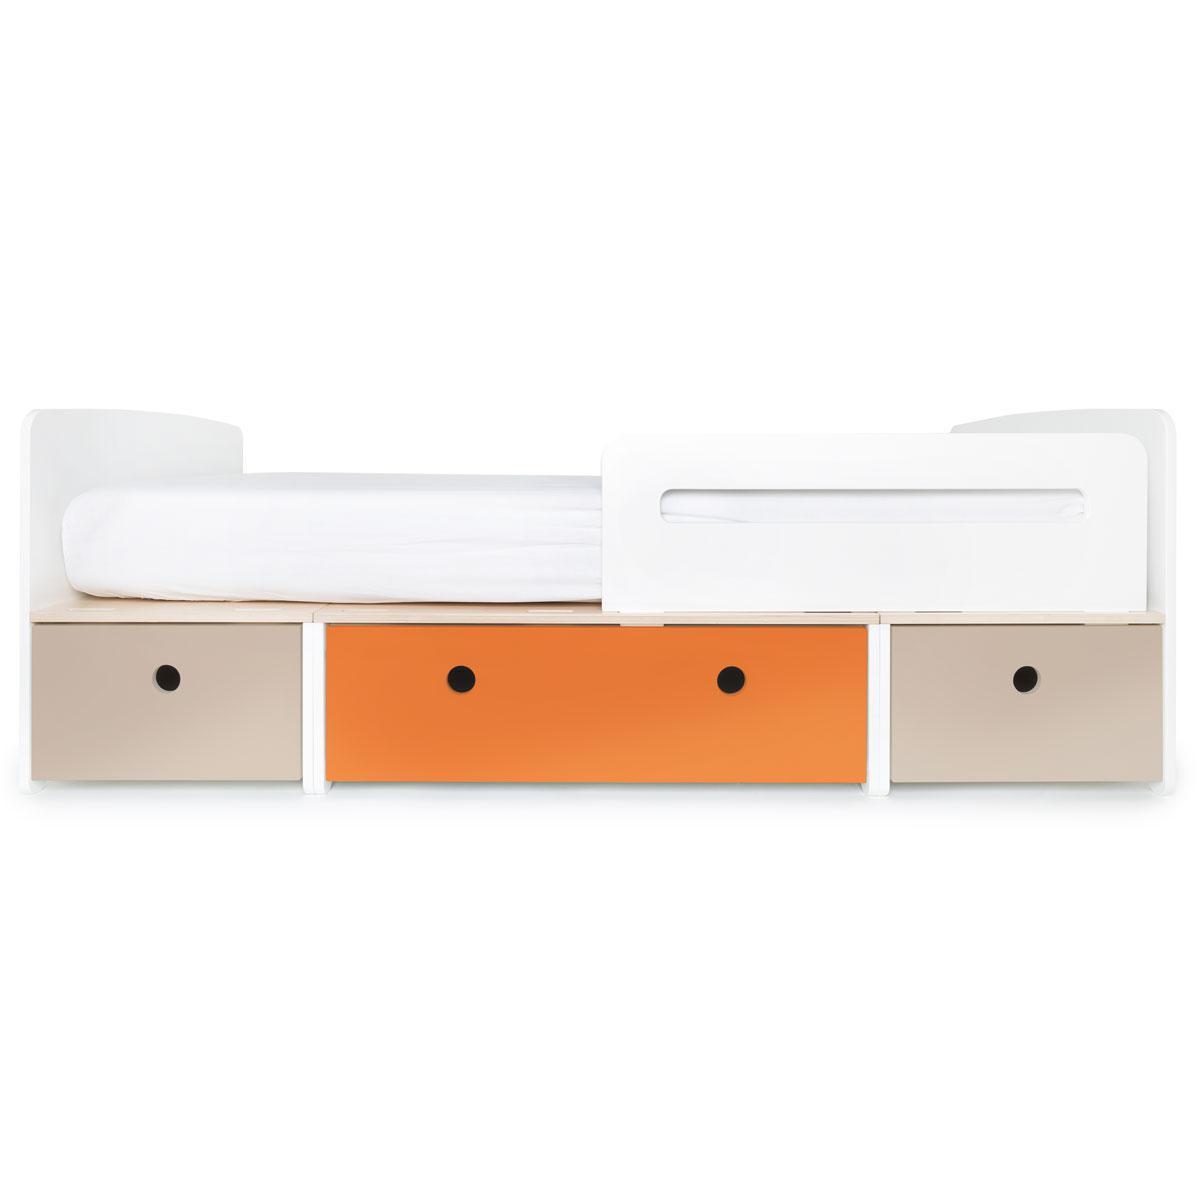 Lit évolutif 90x200cm COLORFLEX warm grey-pure orange-warm grey